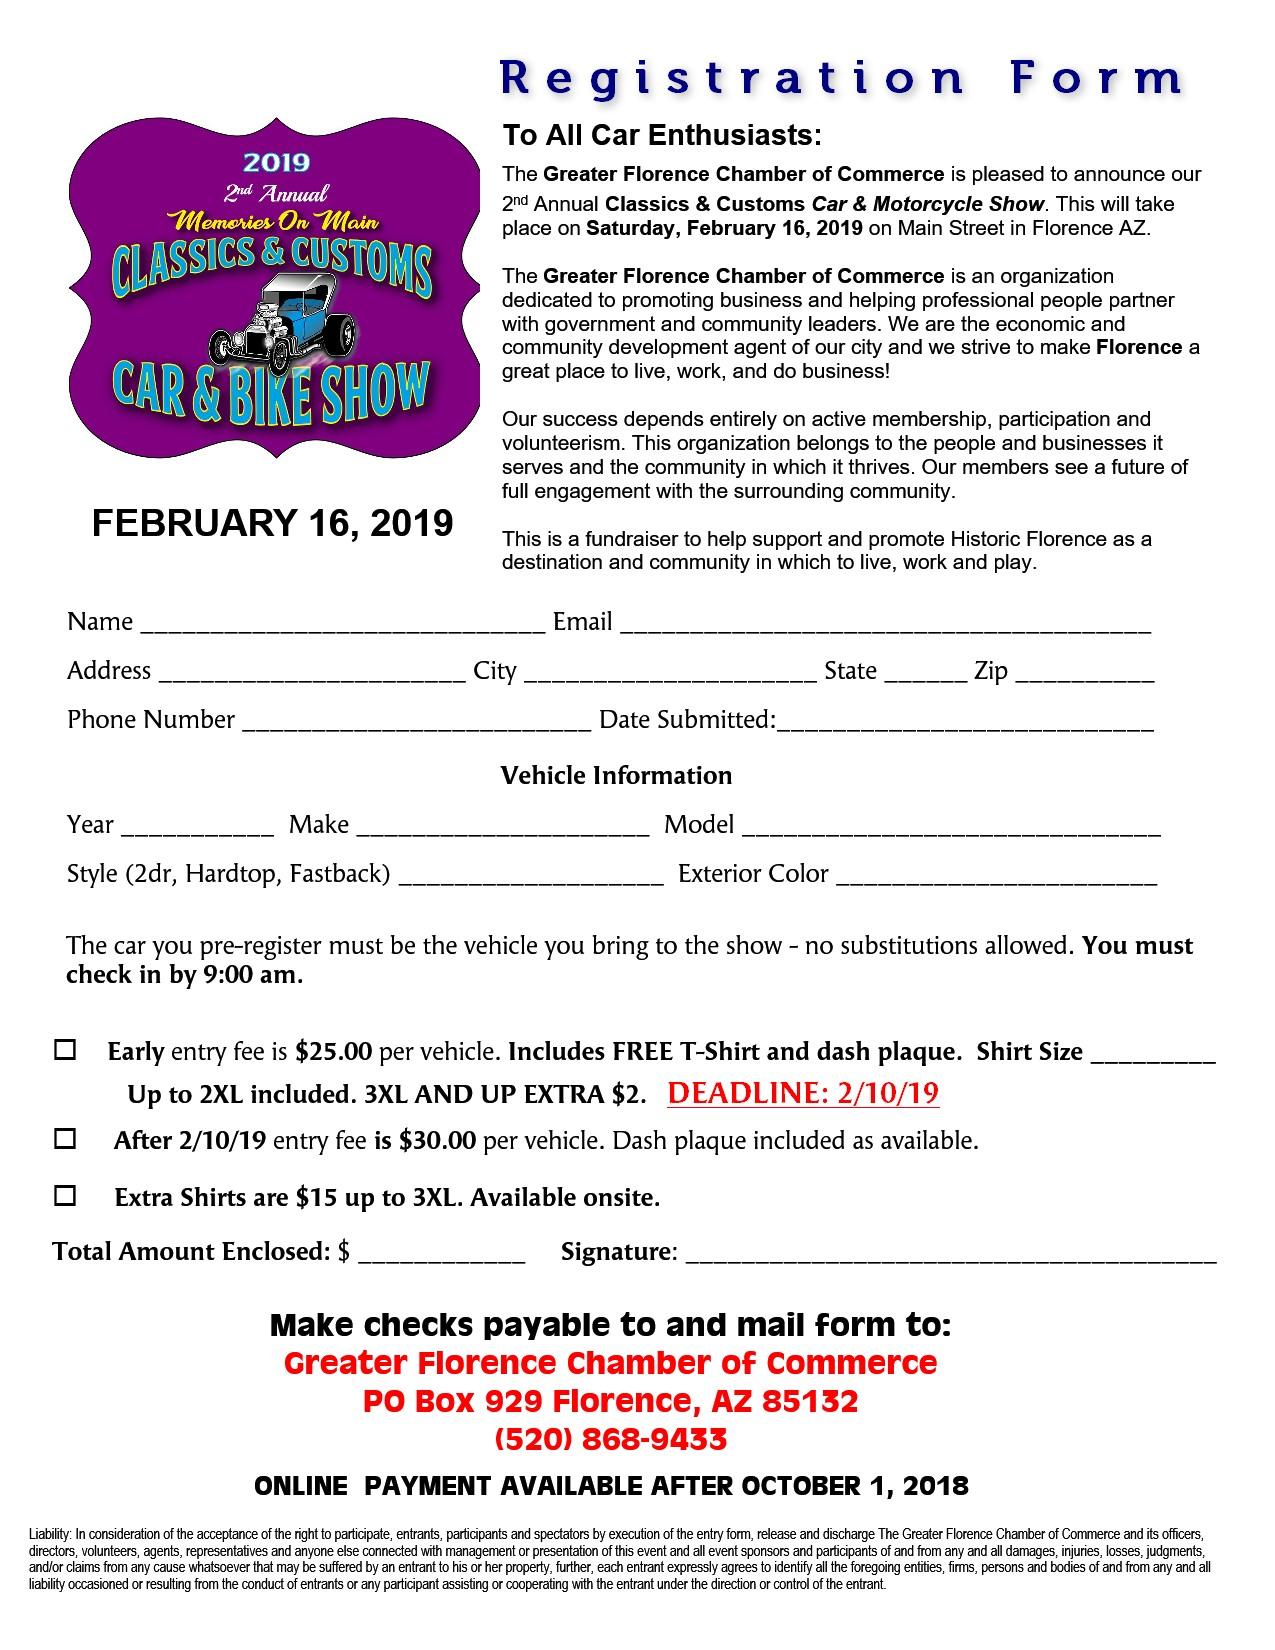 Florence AZ Car Show registration form (image)